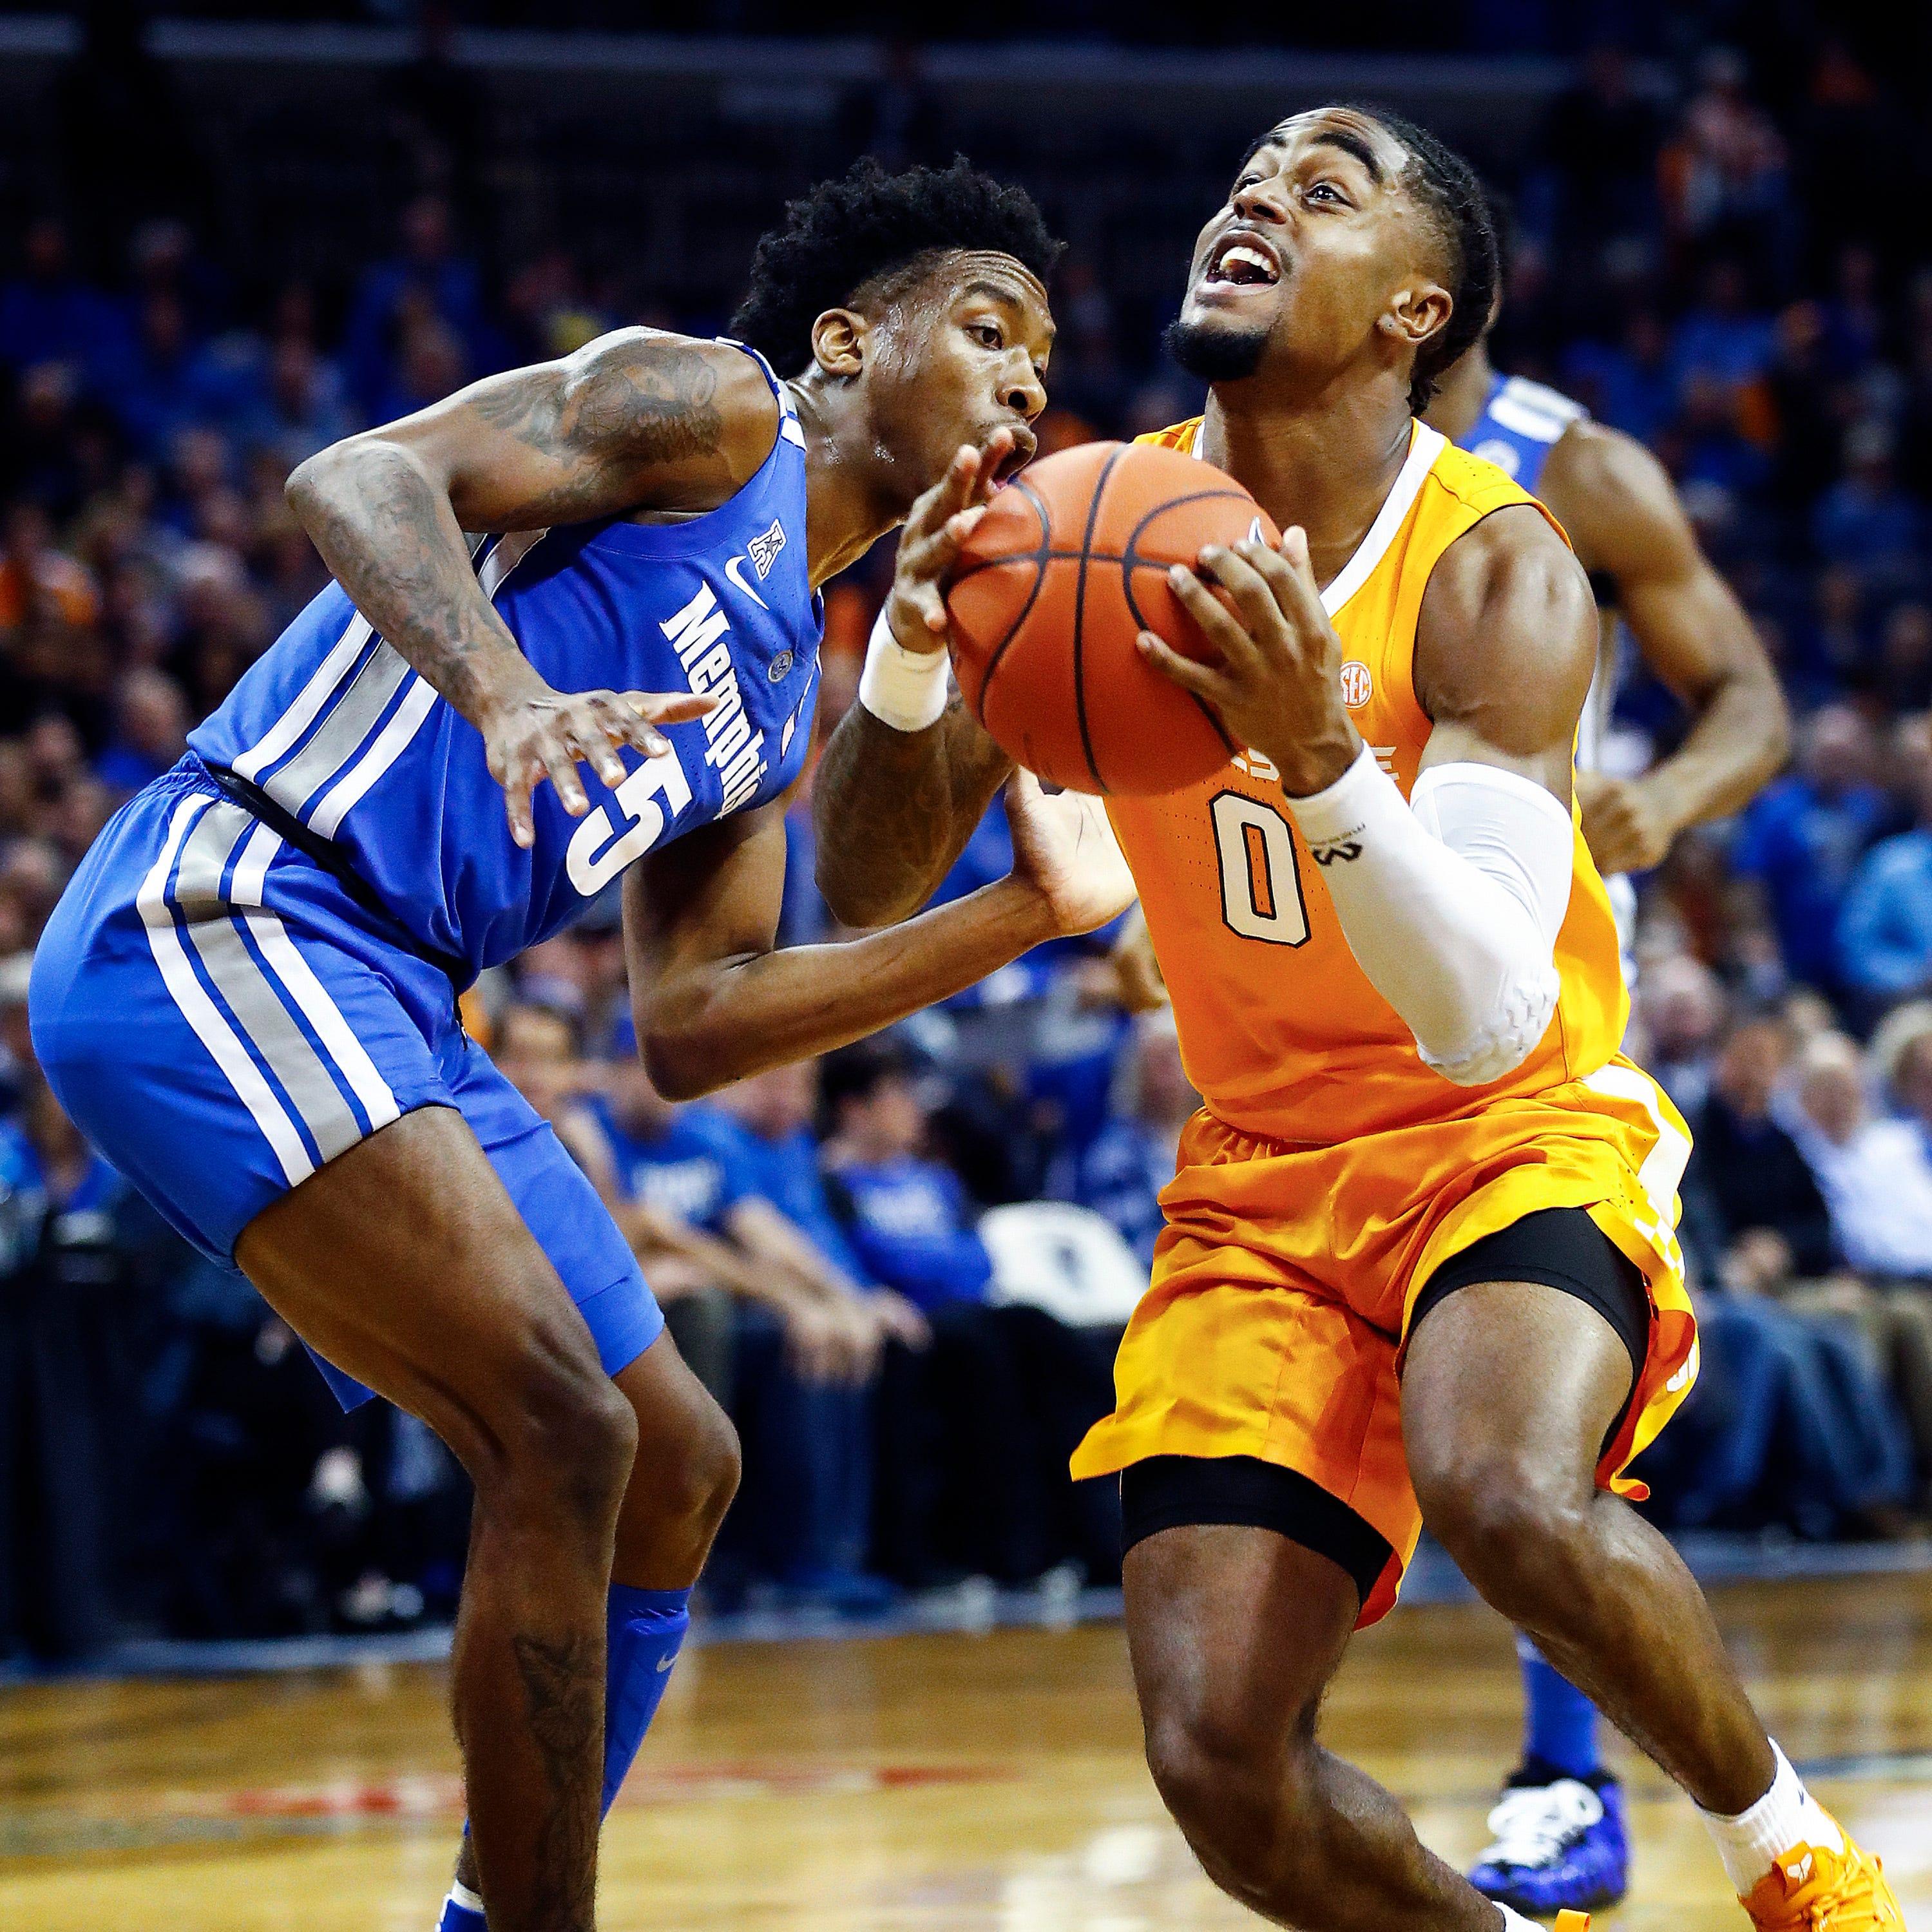 UT 102, Memphis 92: Vols respond to Memphis' second-half push